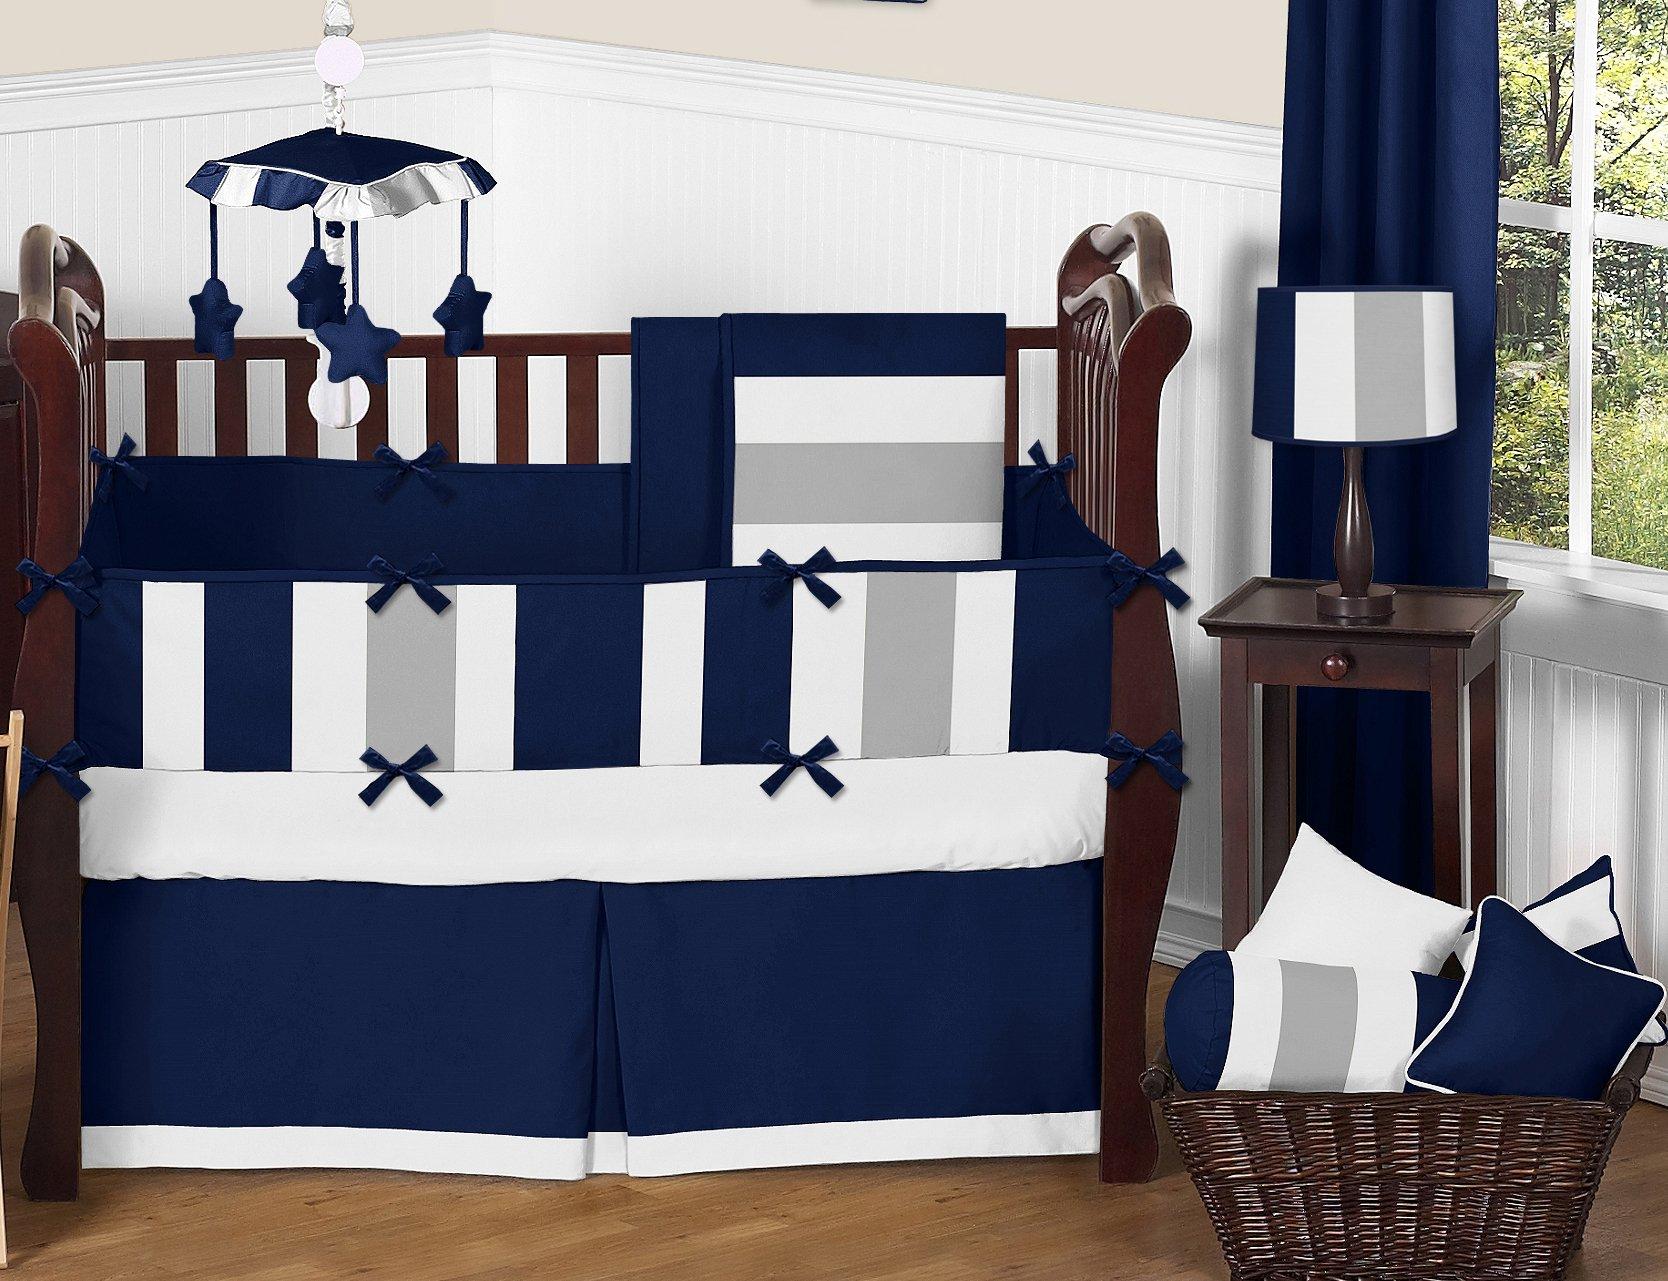 crib bedding jojo piece set cribs designs the sloane sweet collection pin for